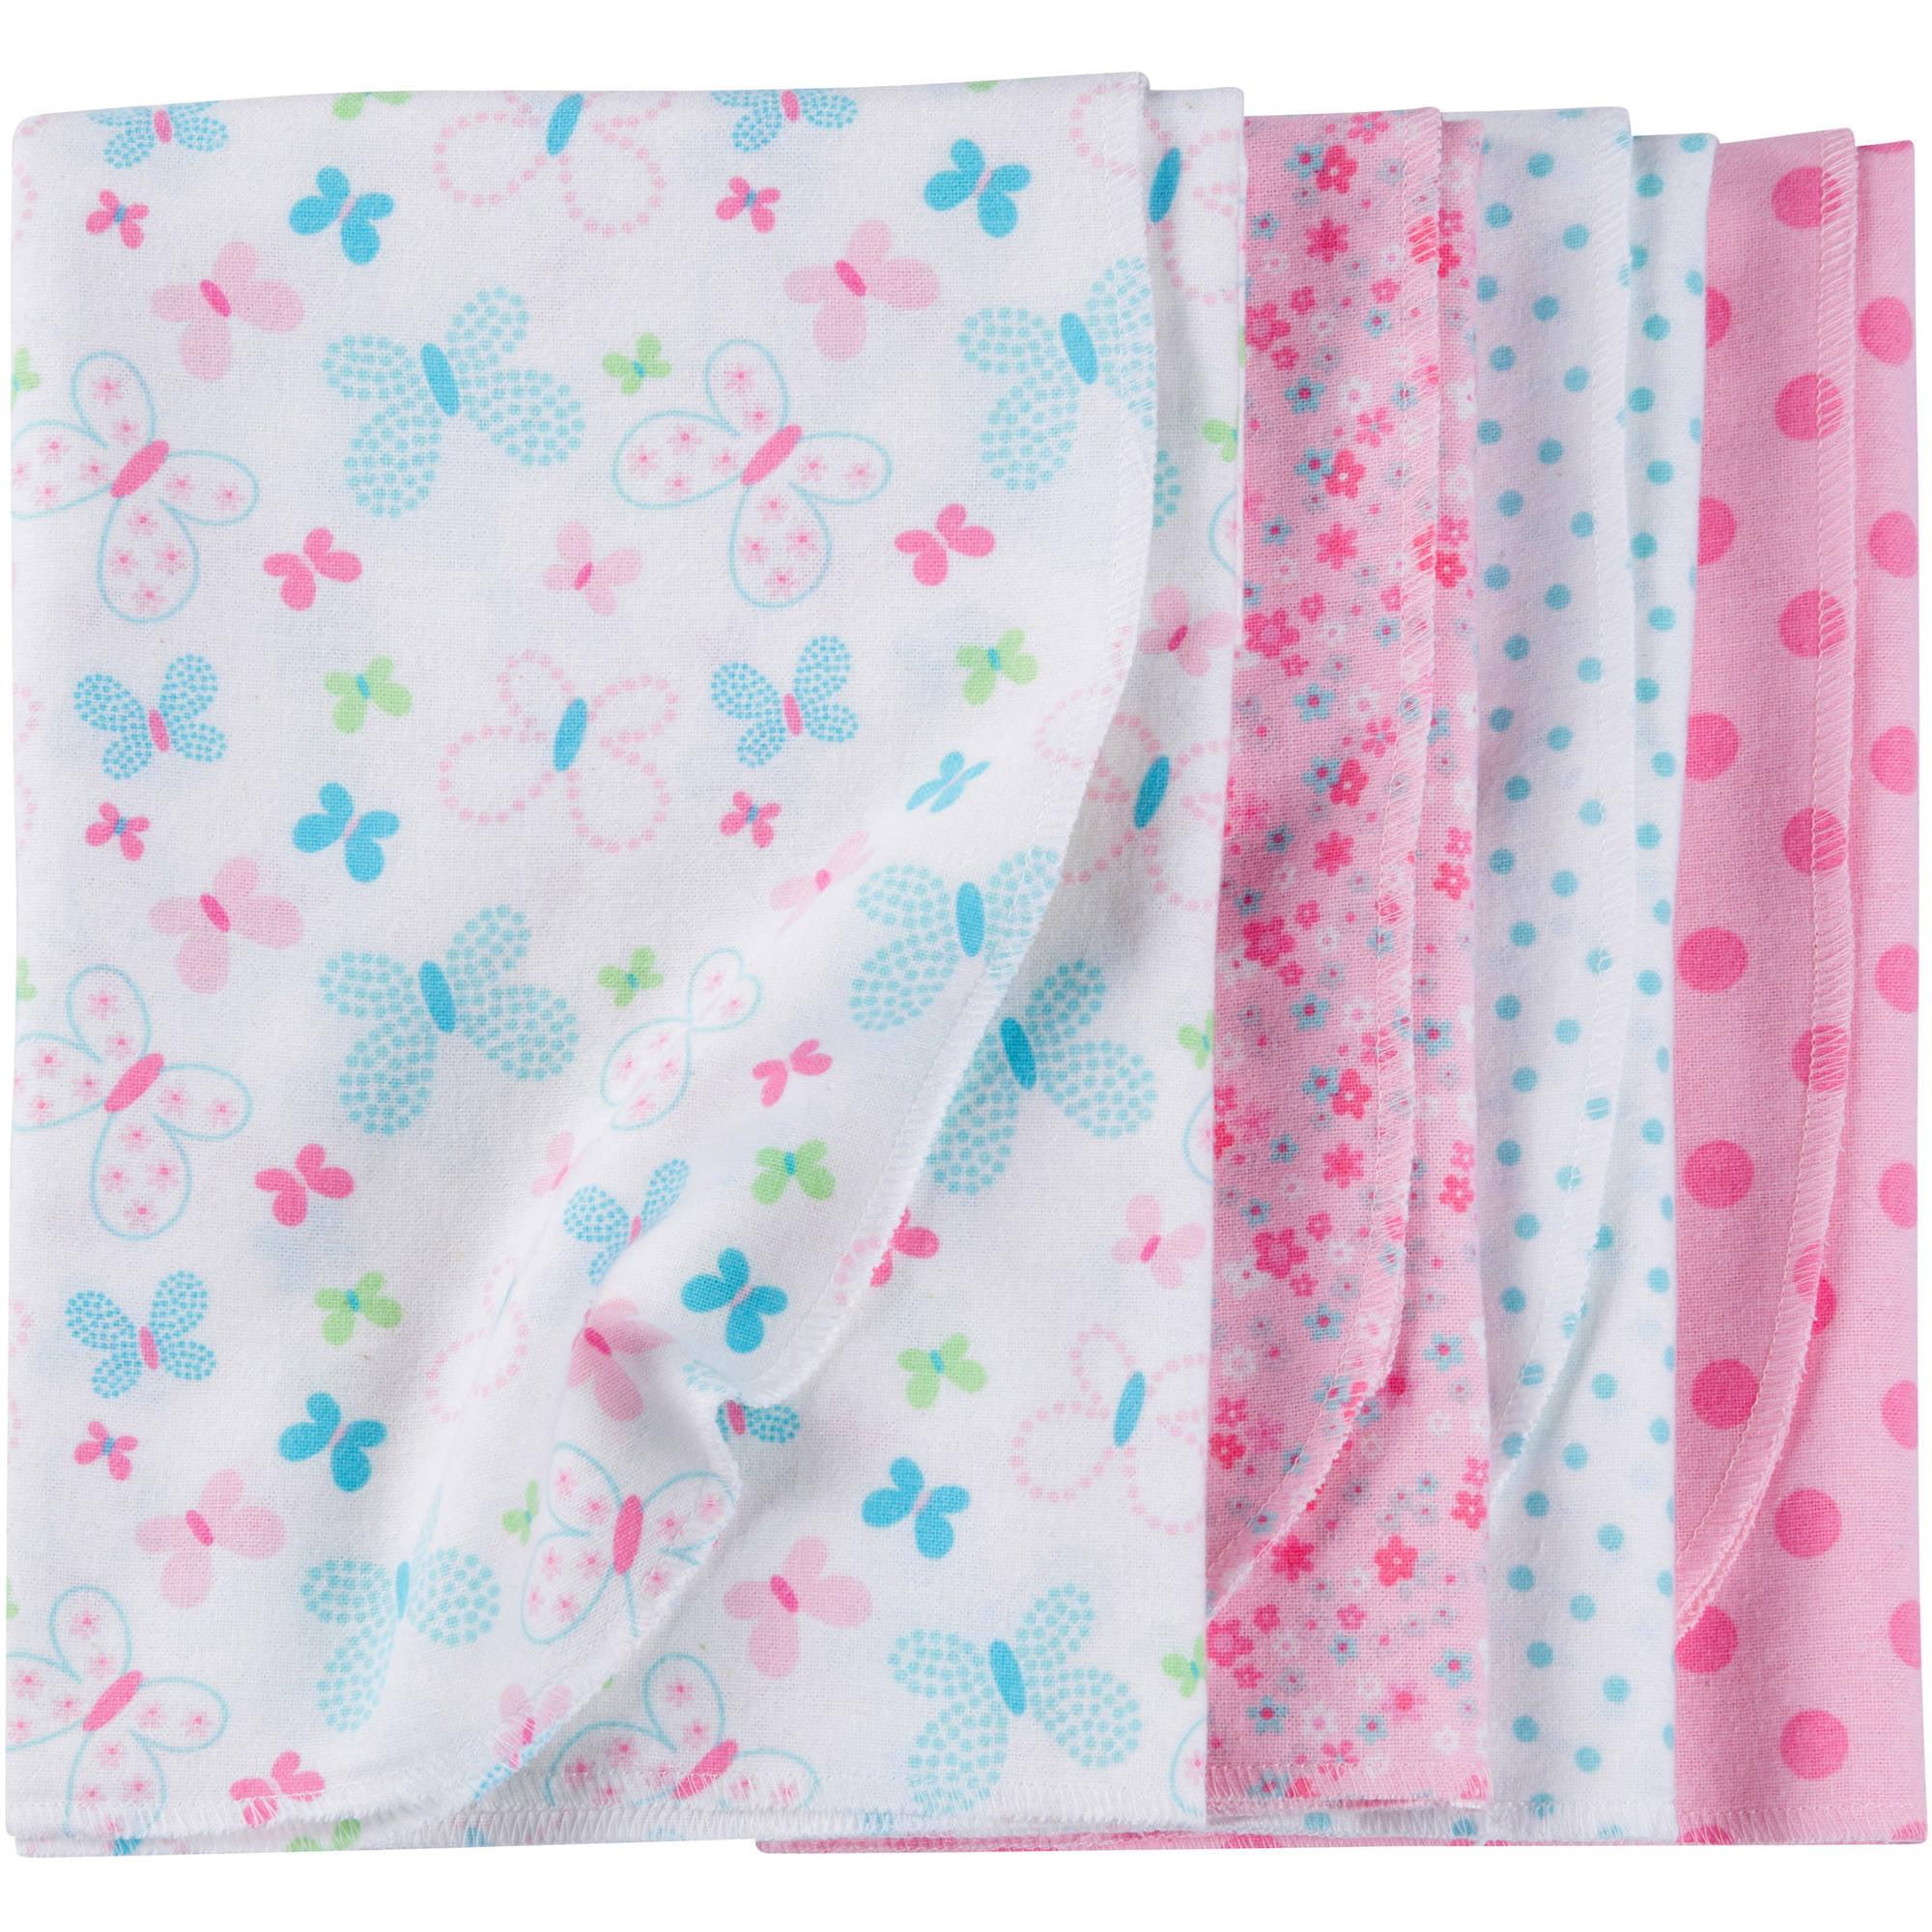 Gerber Newborn Baby Girl Flannel Receiving Blankets, 4-Pack